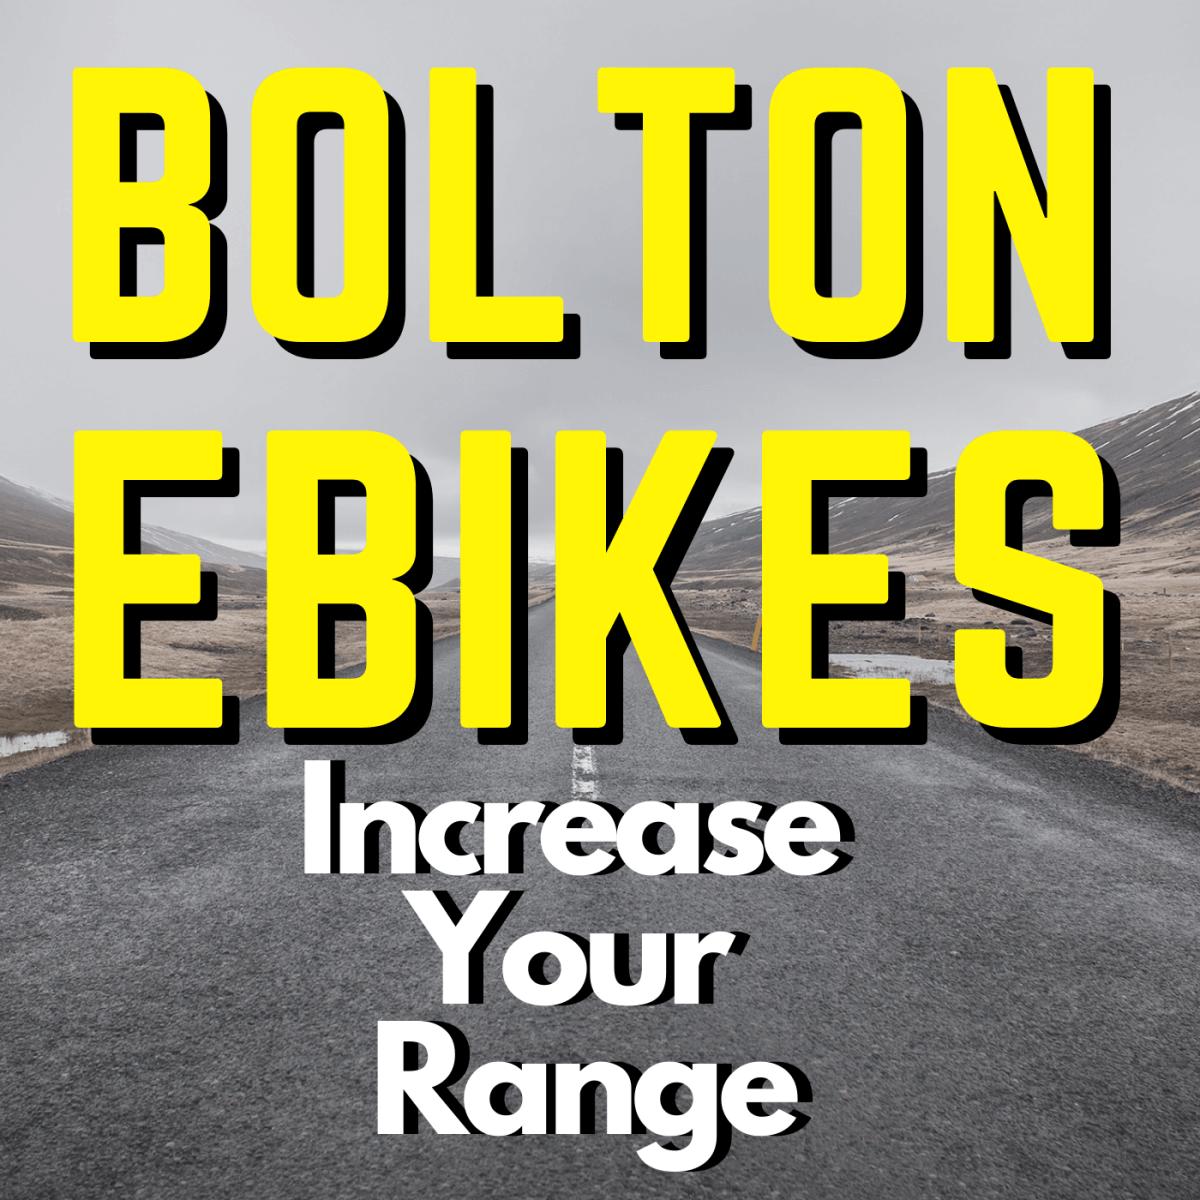 Increase your range - FREE!